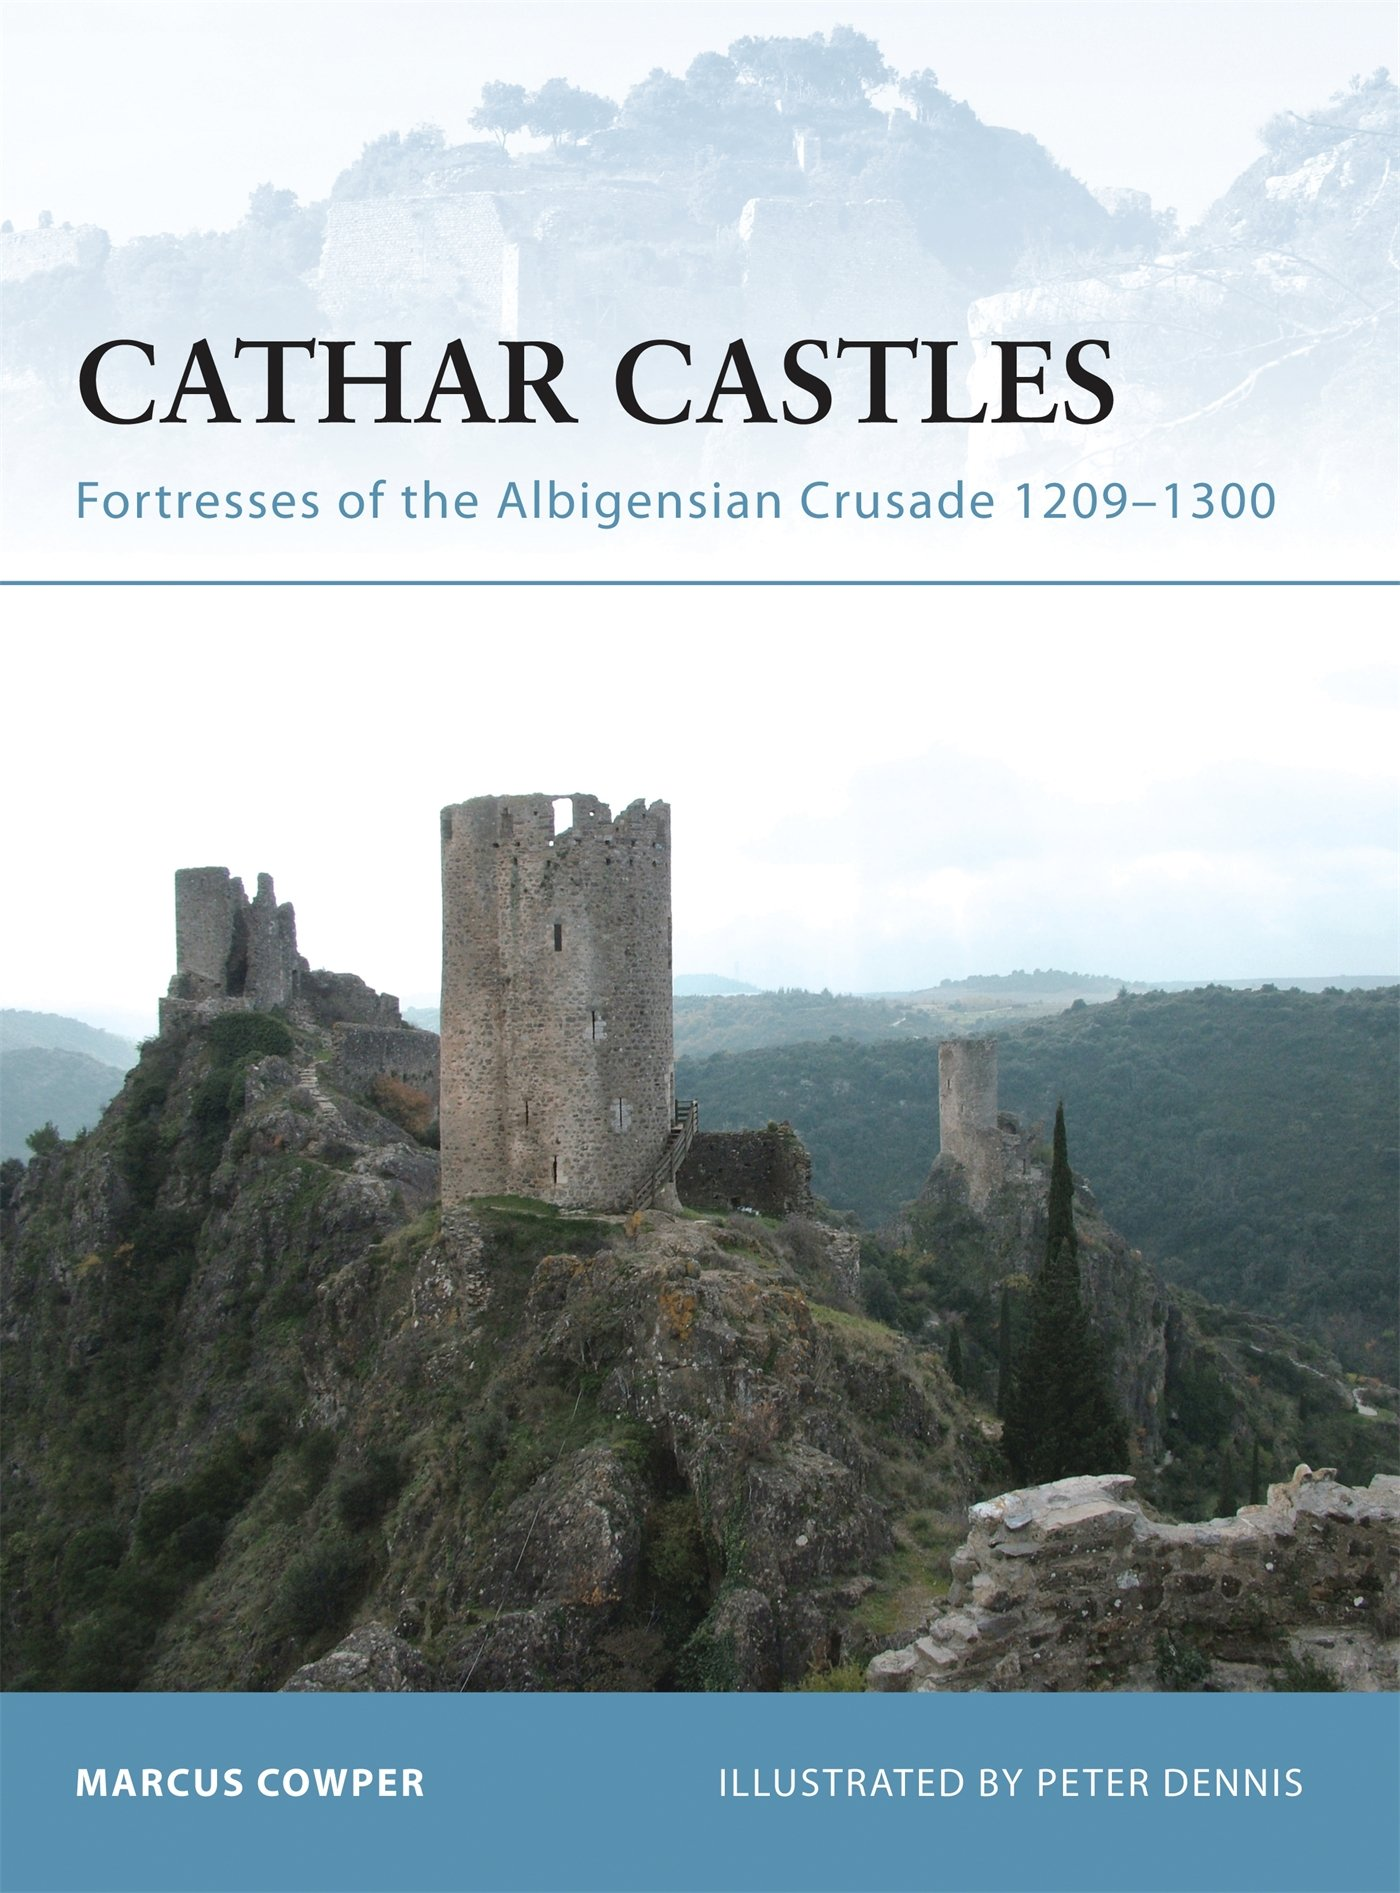 Amazon.com: Cathar Castles: Fortresses of the Albigensian Crusade 1209–1300  (9781846030666): Cowper, Marcus, Dennis, Peter: Books